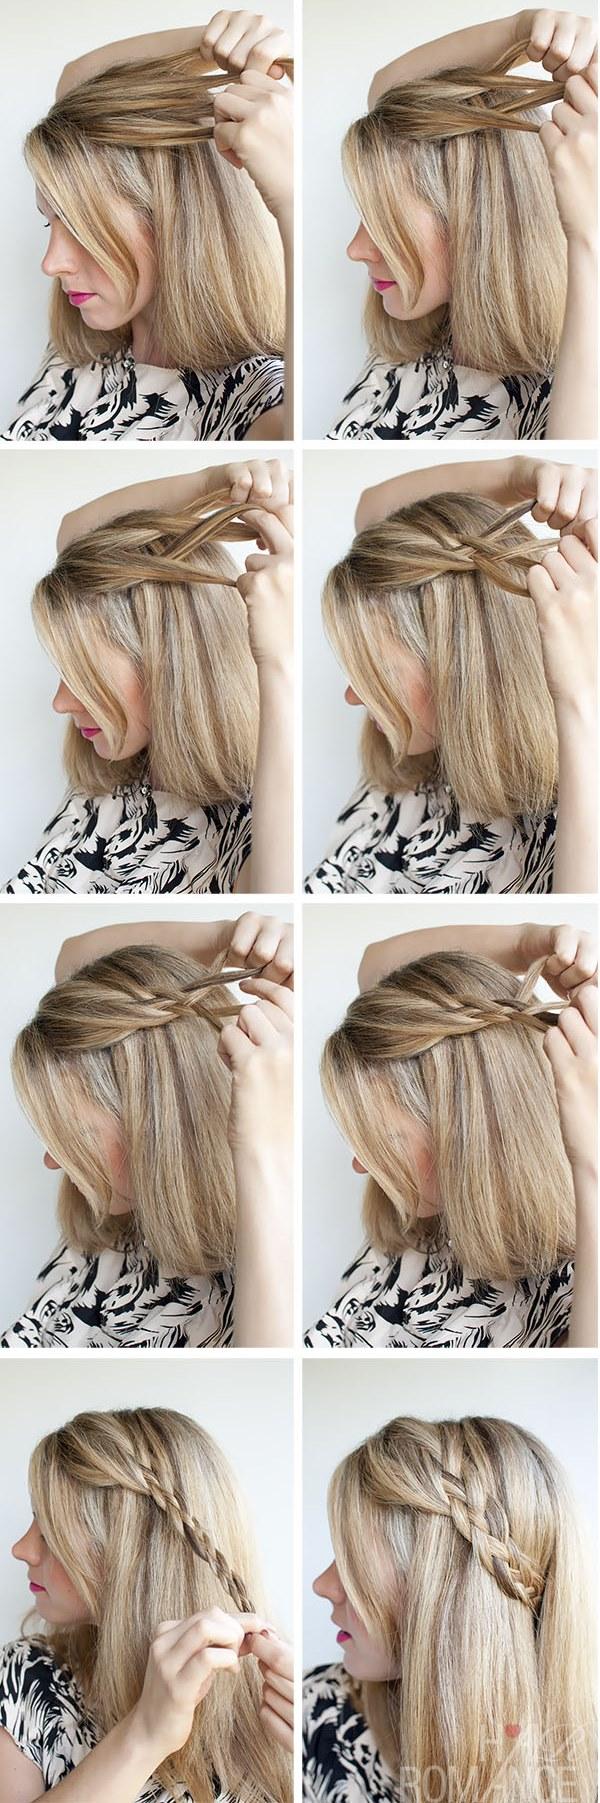 Hair-Romance-4-Strand-Braid-Tutorial-version-1